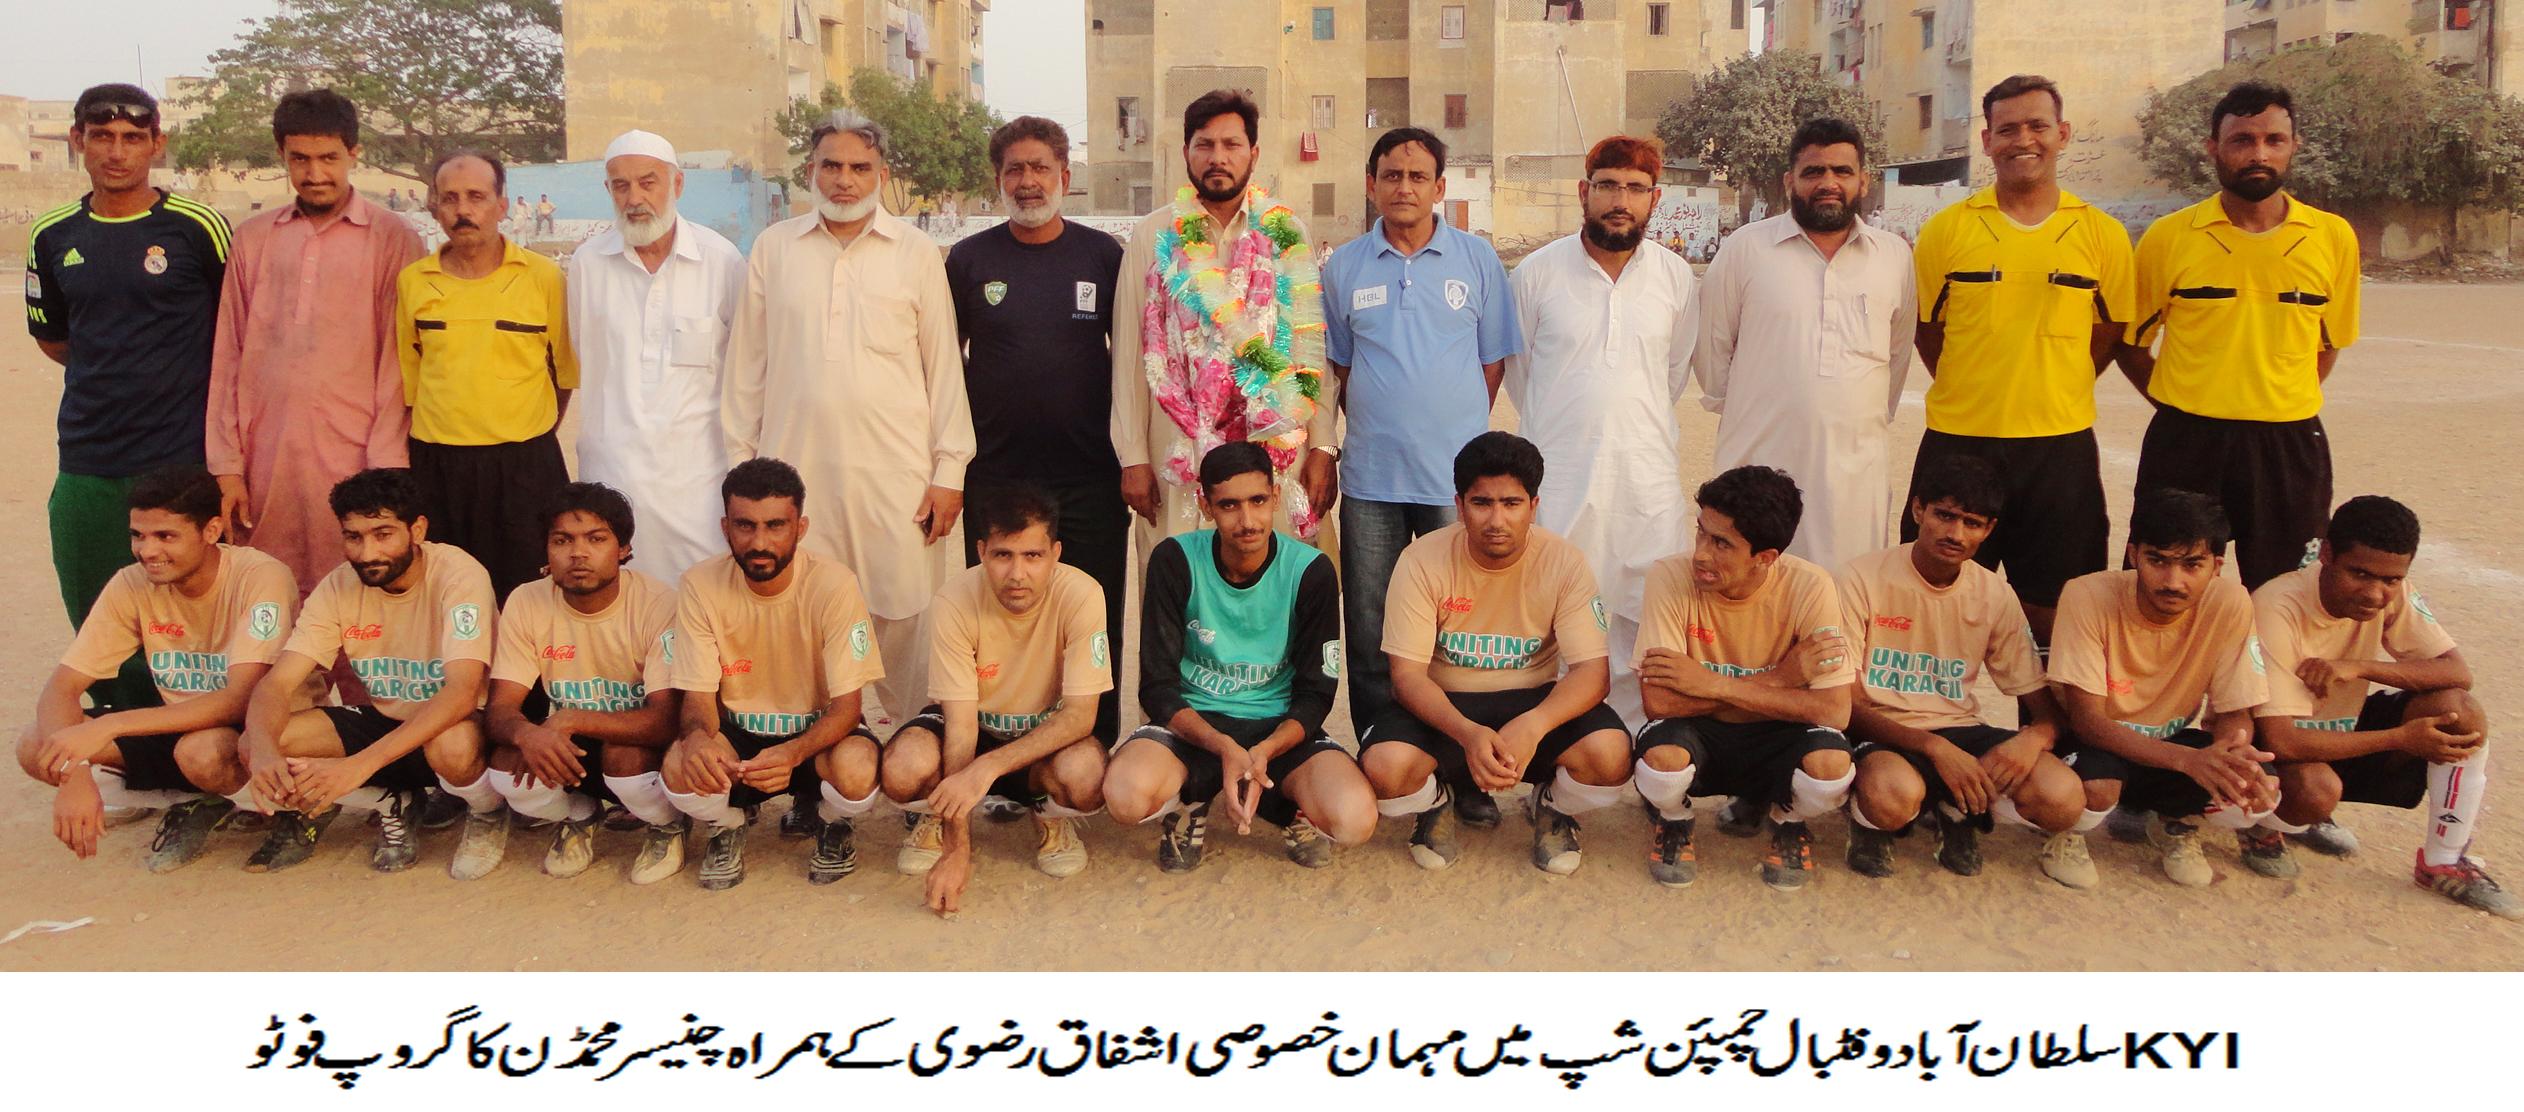 Coca-Cola Sultanabad Championship: Al-Wajid and Chanesar Mohammedan reach quarter-finals